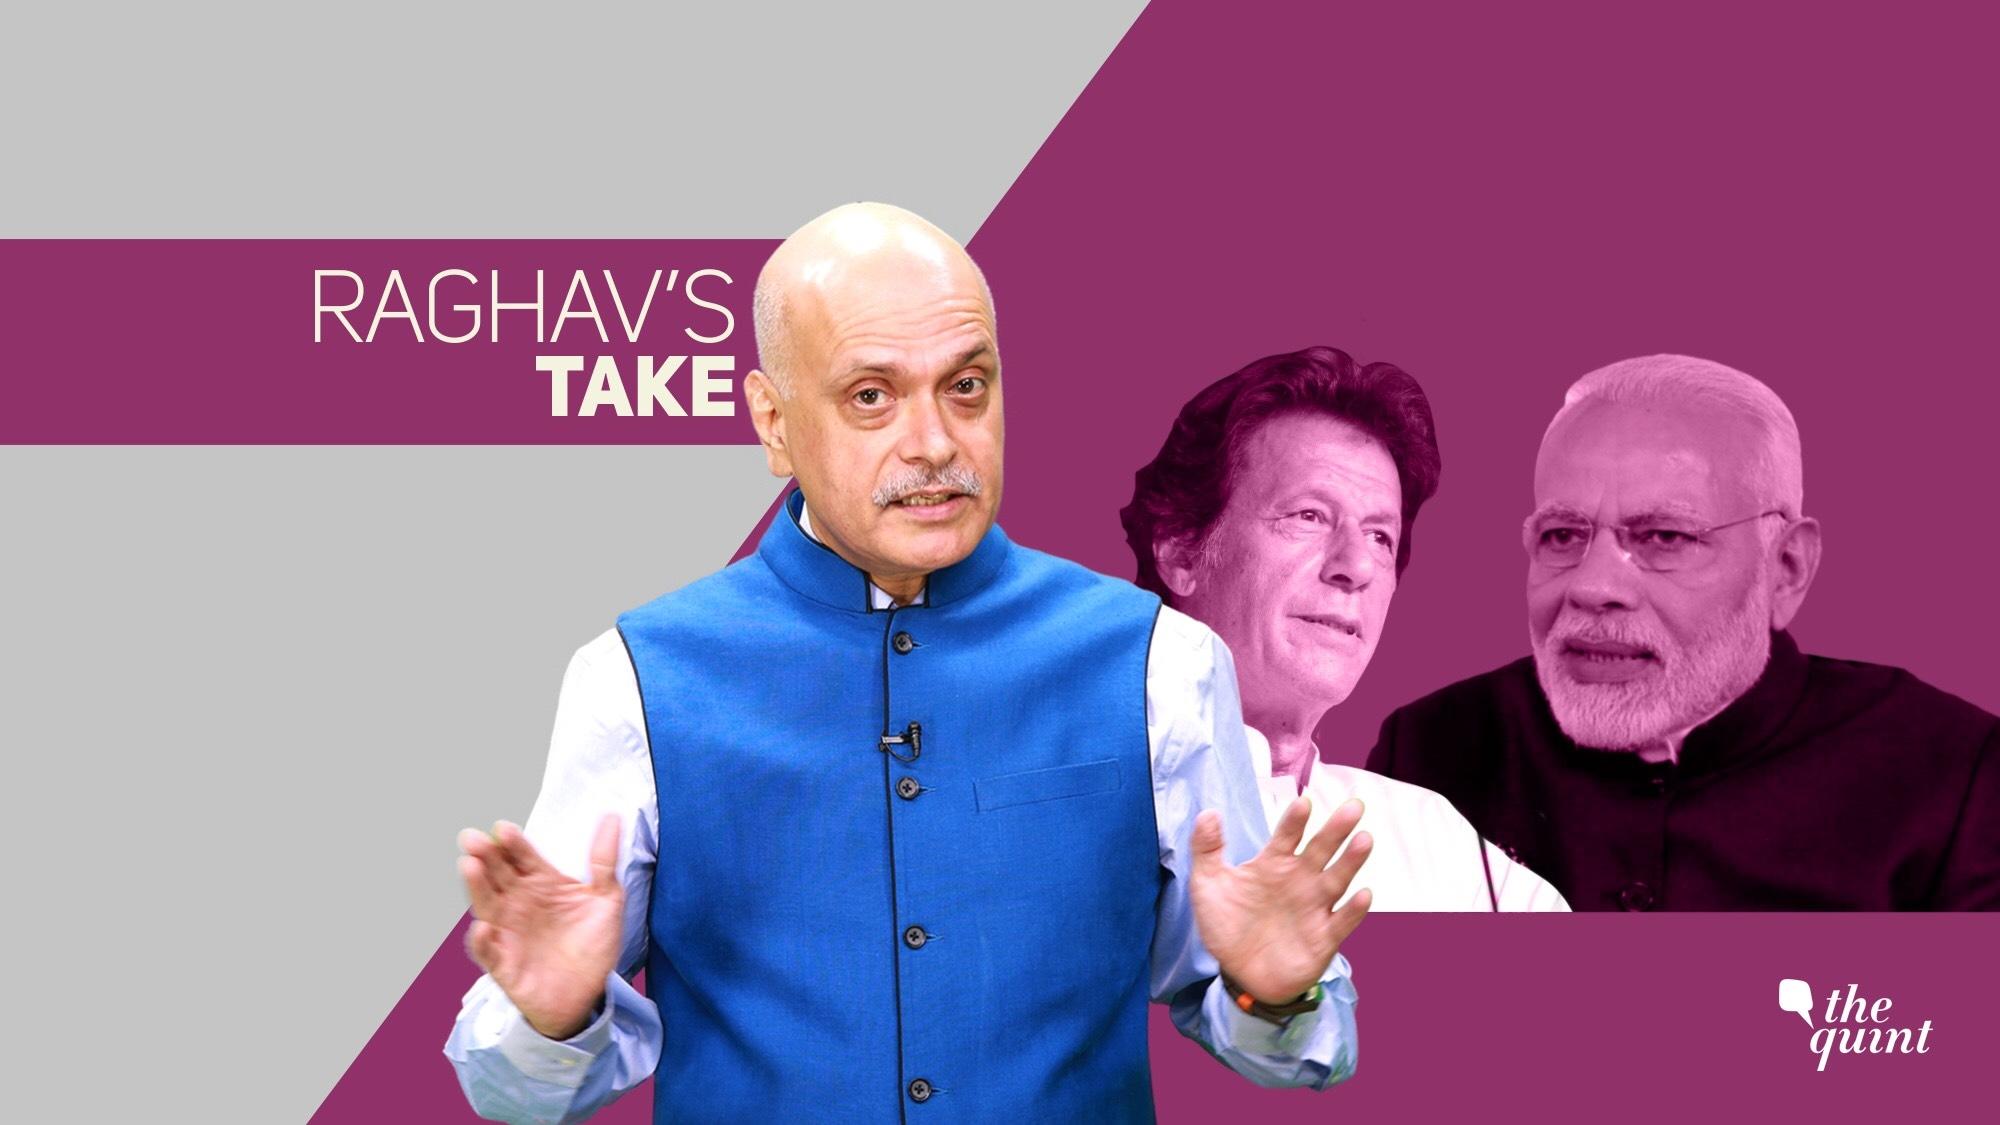 Pakistan's Imran Khan Leads 1-0 as Modi Re-Nationalises Companies